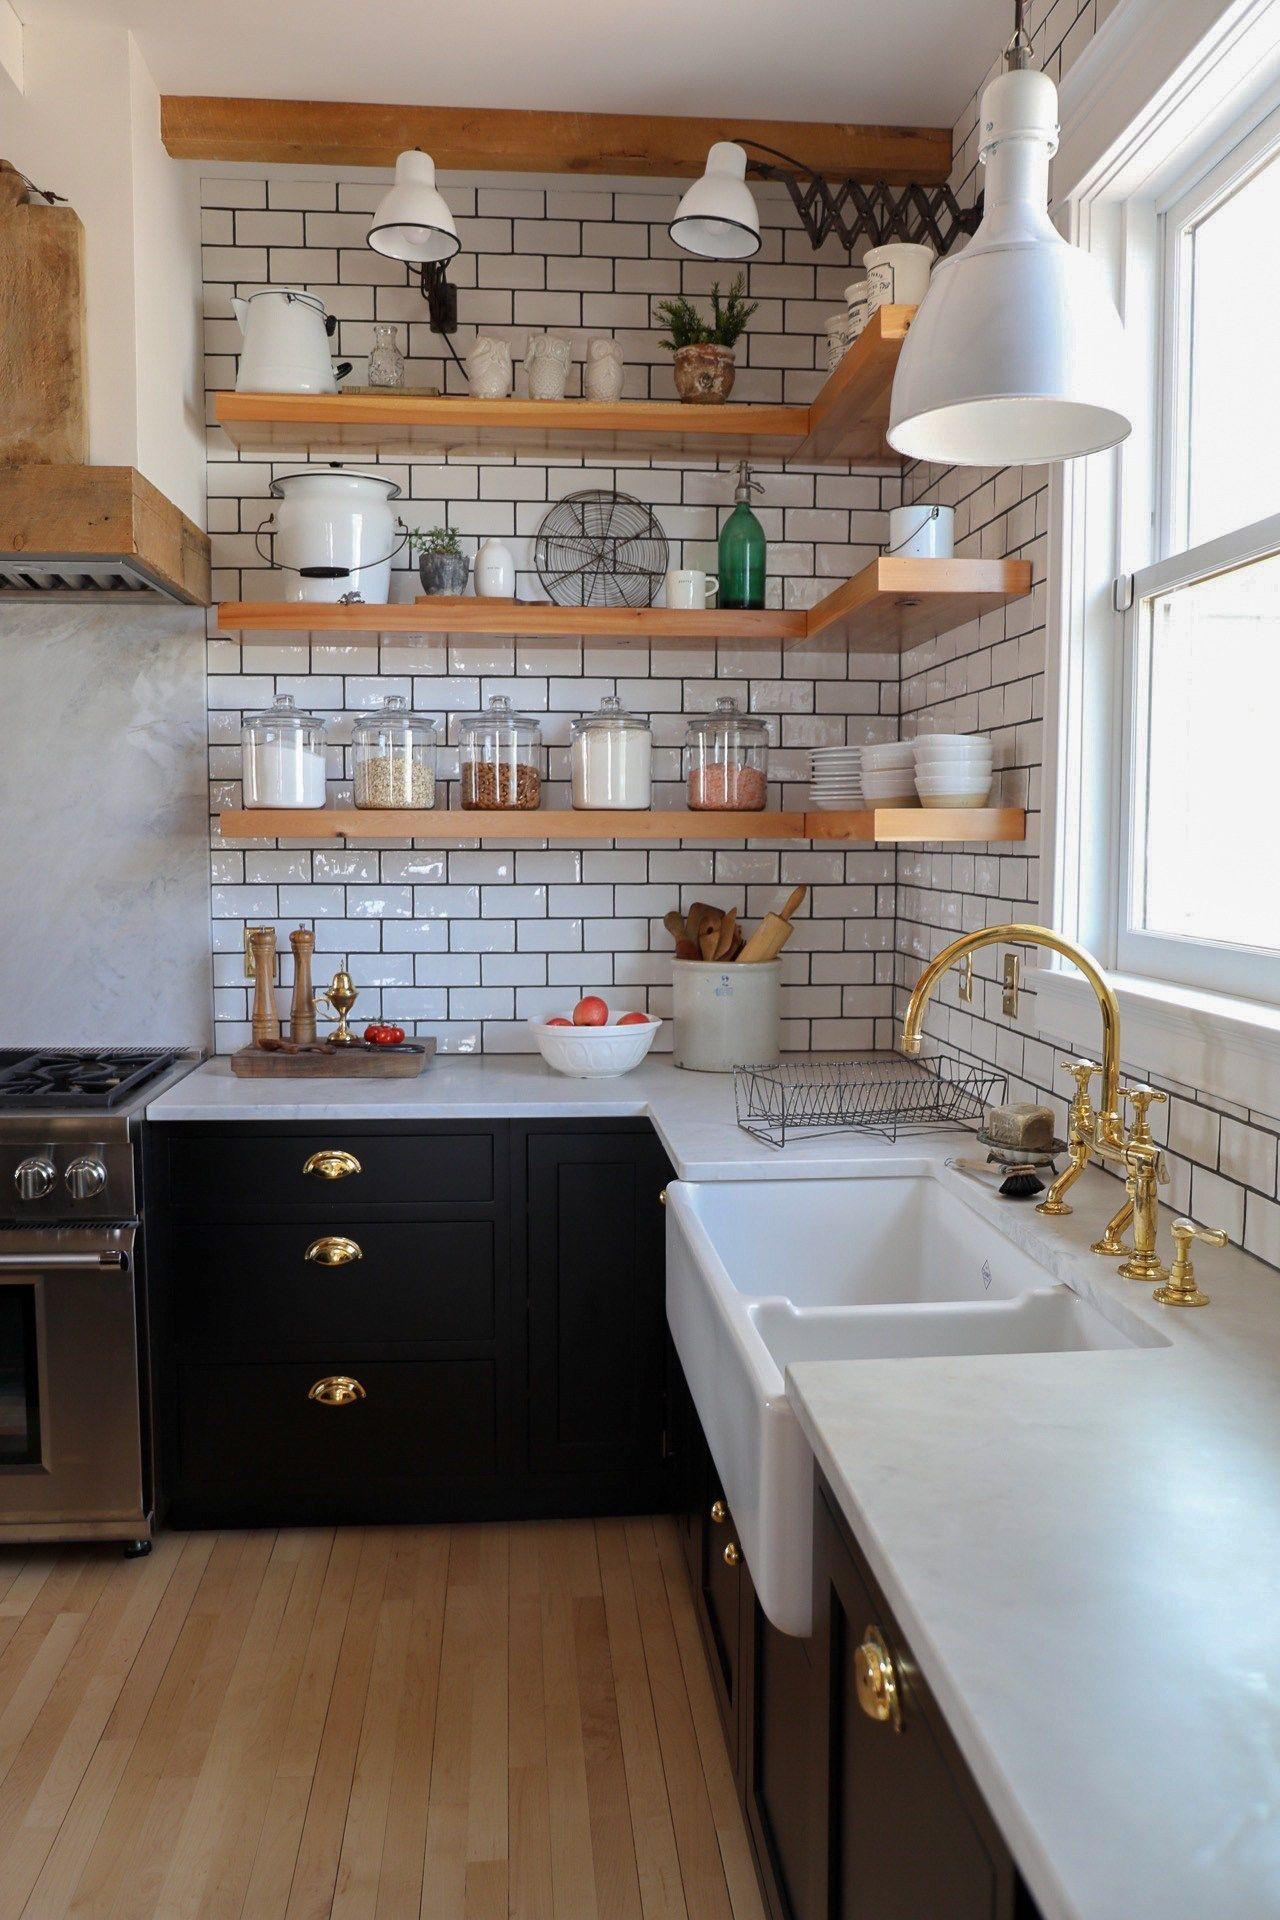 7 Defining Features of Farmhouse Kitchens | Farmhouse ...